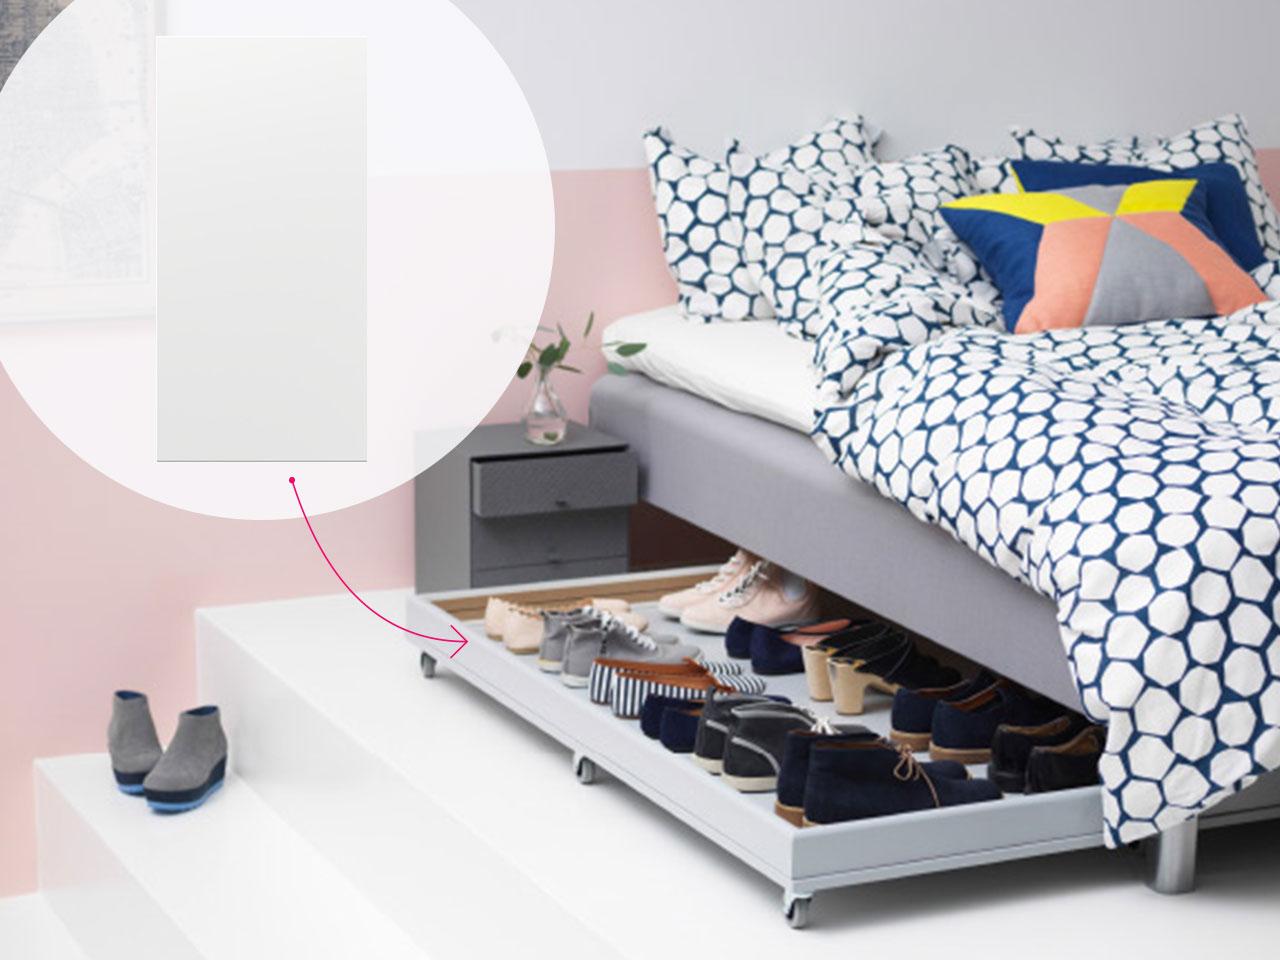 Ikea Hack diy ikea hacks 20 ingenious diy ikea hacks you should try 20 ingenious diy ikea hacks you